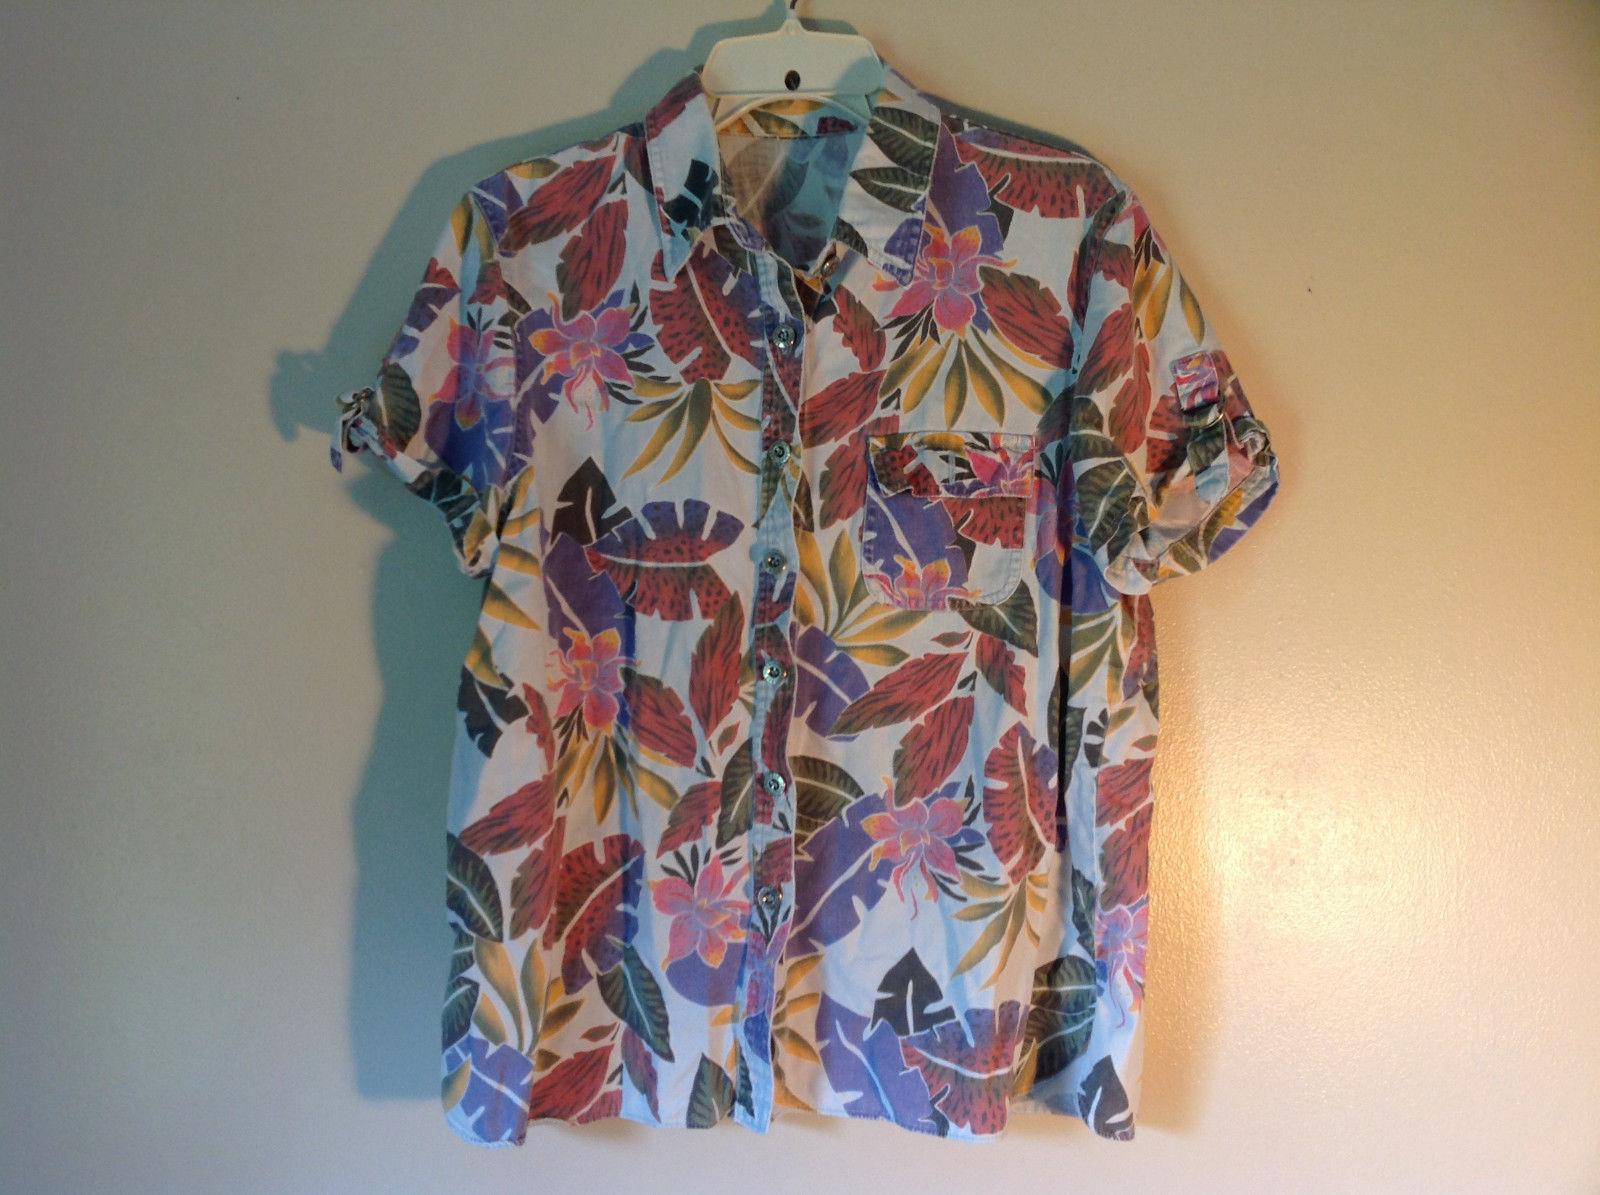 Sag Harbor Hawaiian Motif Button Up Collared Shirt w Adjustable Sleeves No Tag